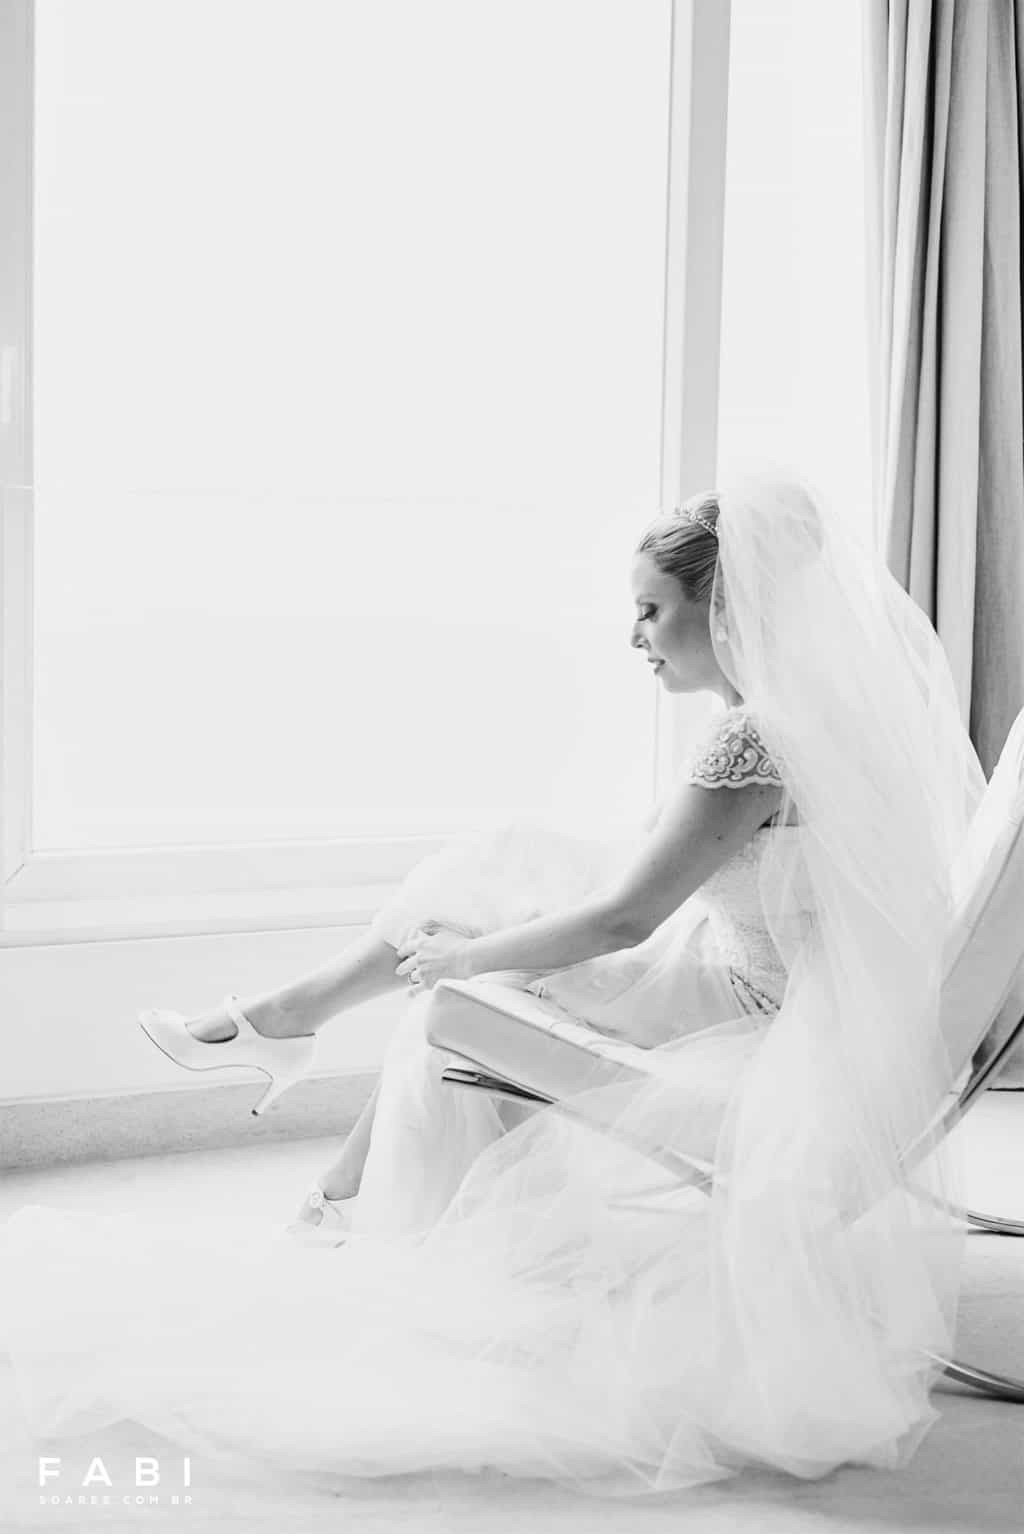 casamento-joyce-e-andre-caseme-foto-fabricia-soares-09